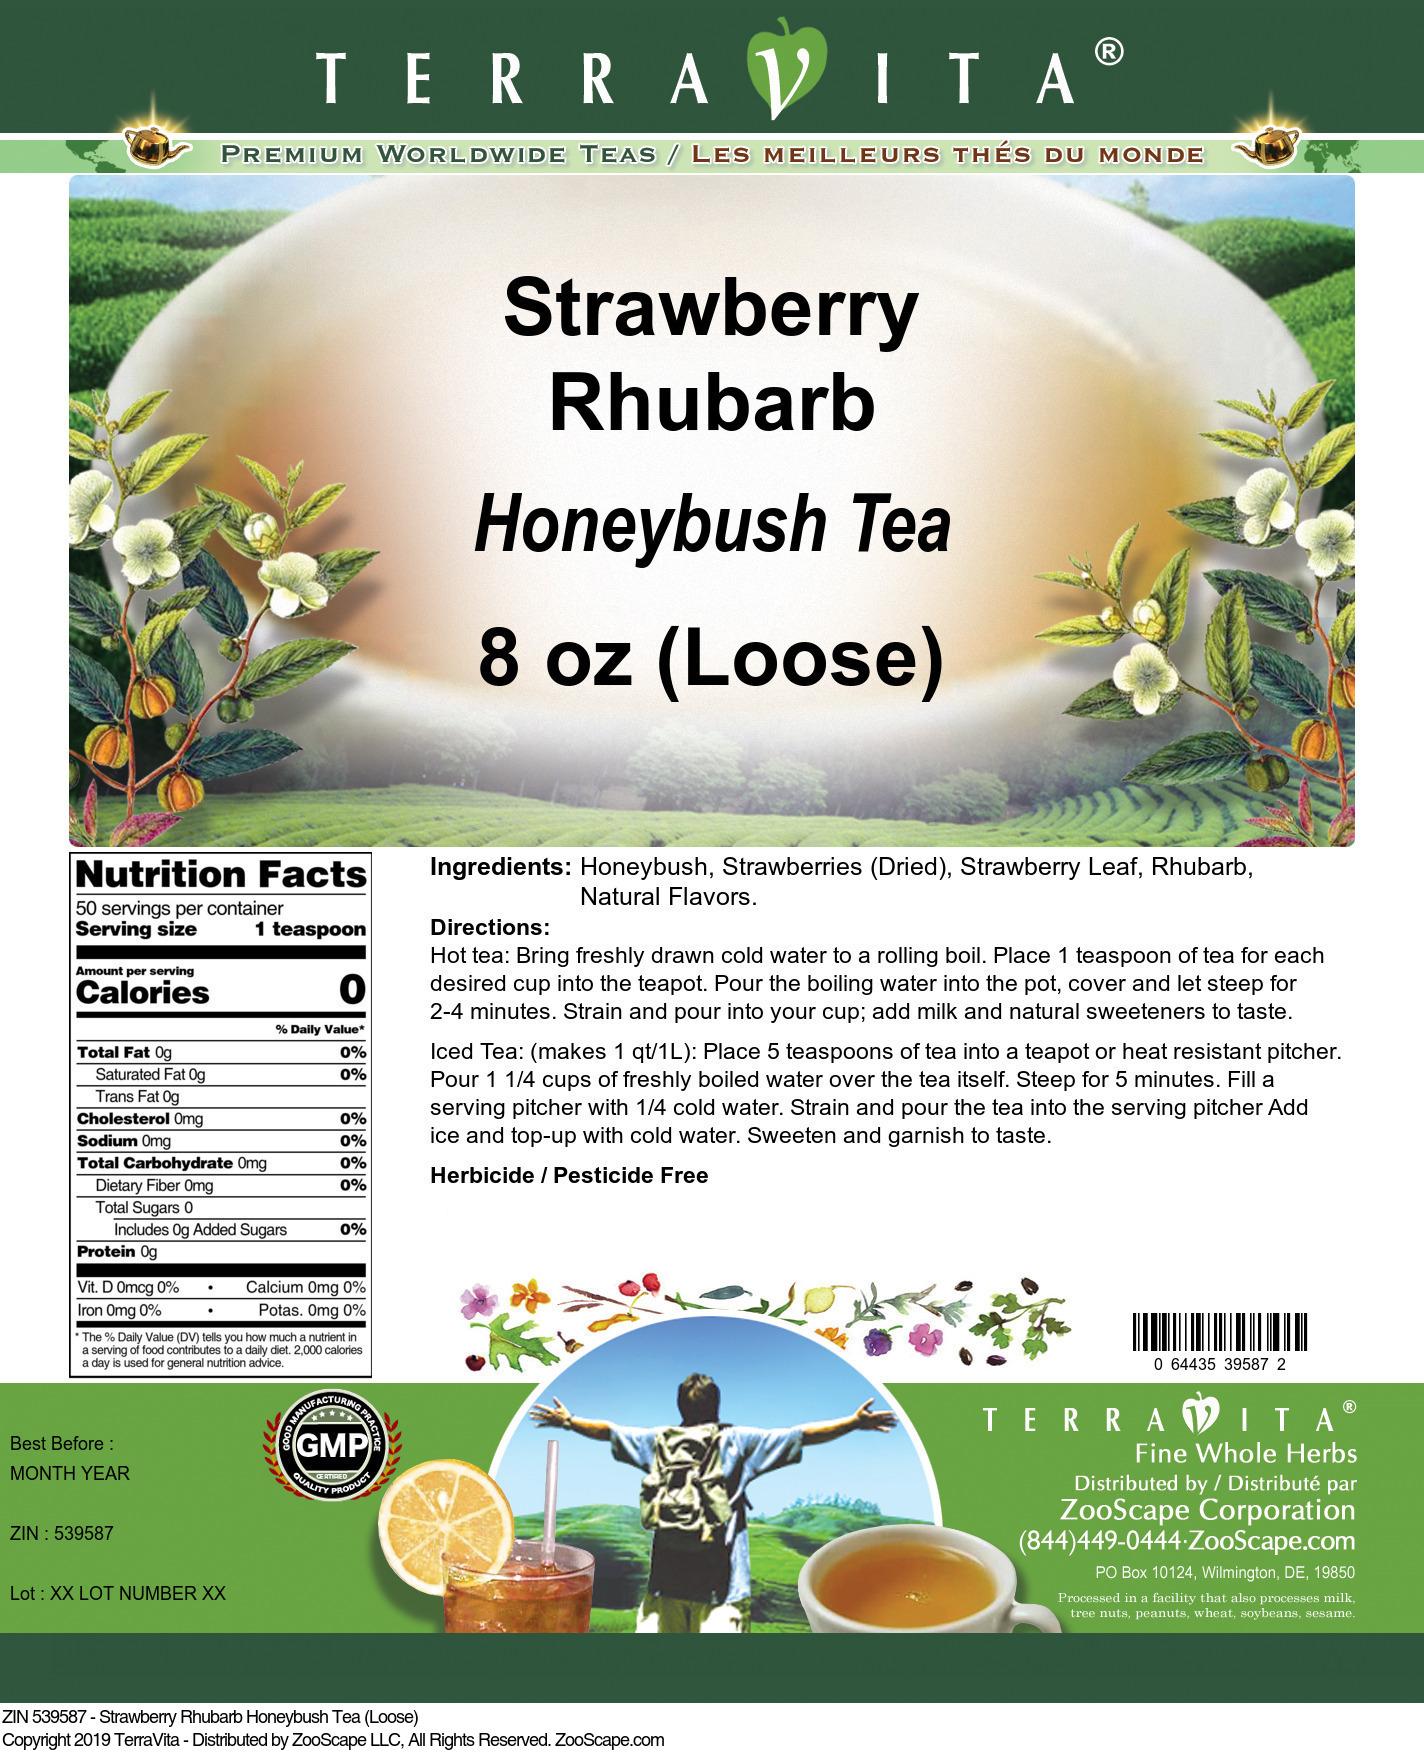 Strawberry Rhubarb Honeybush Tea (Loose)